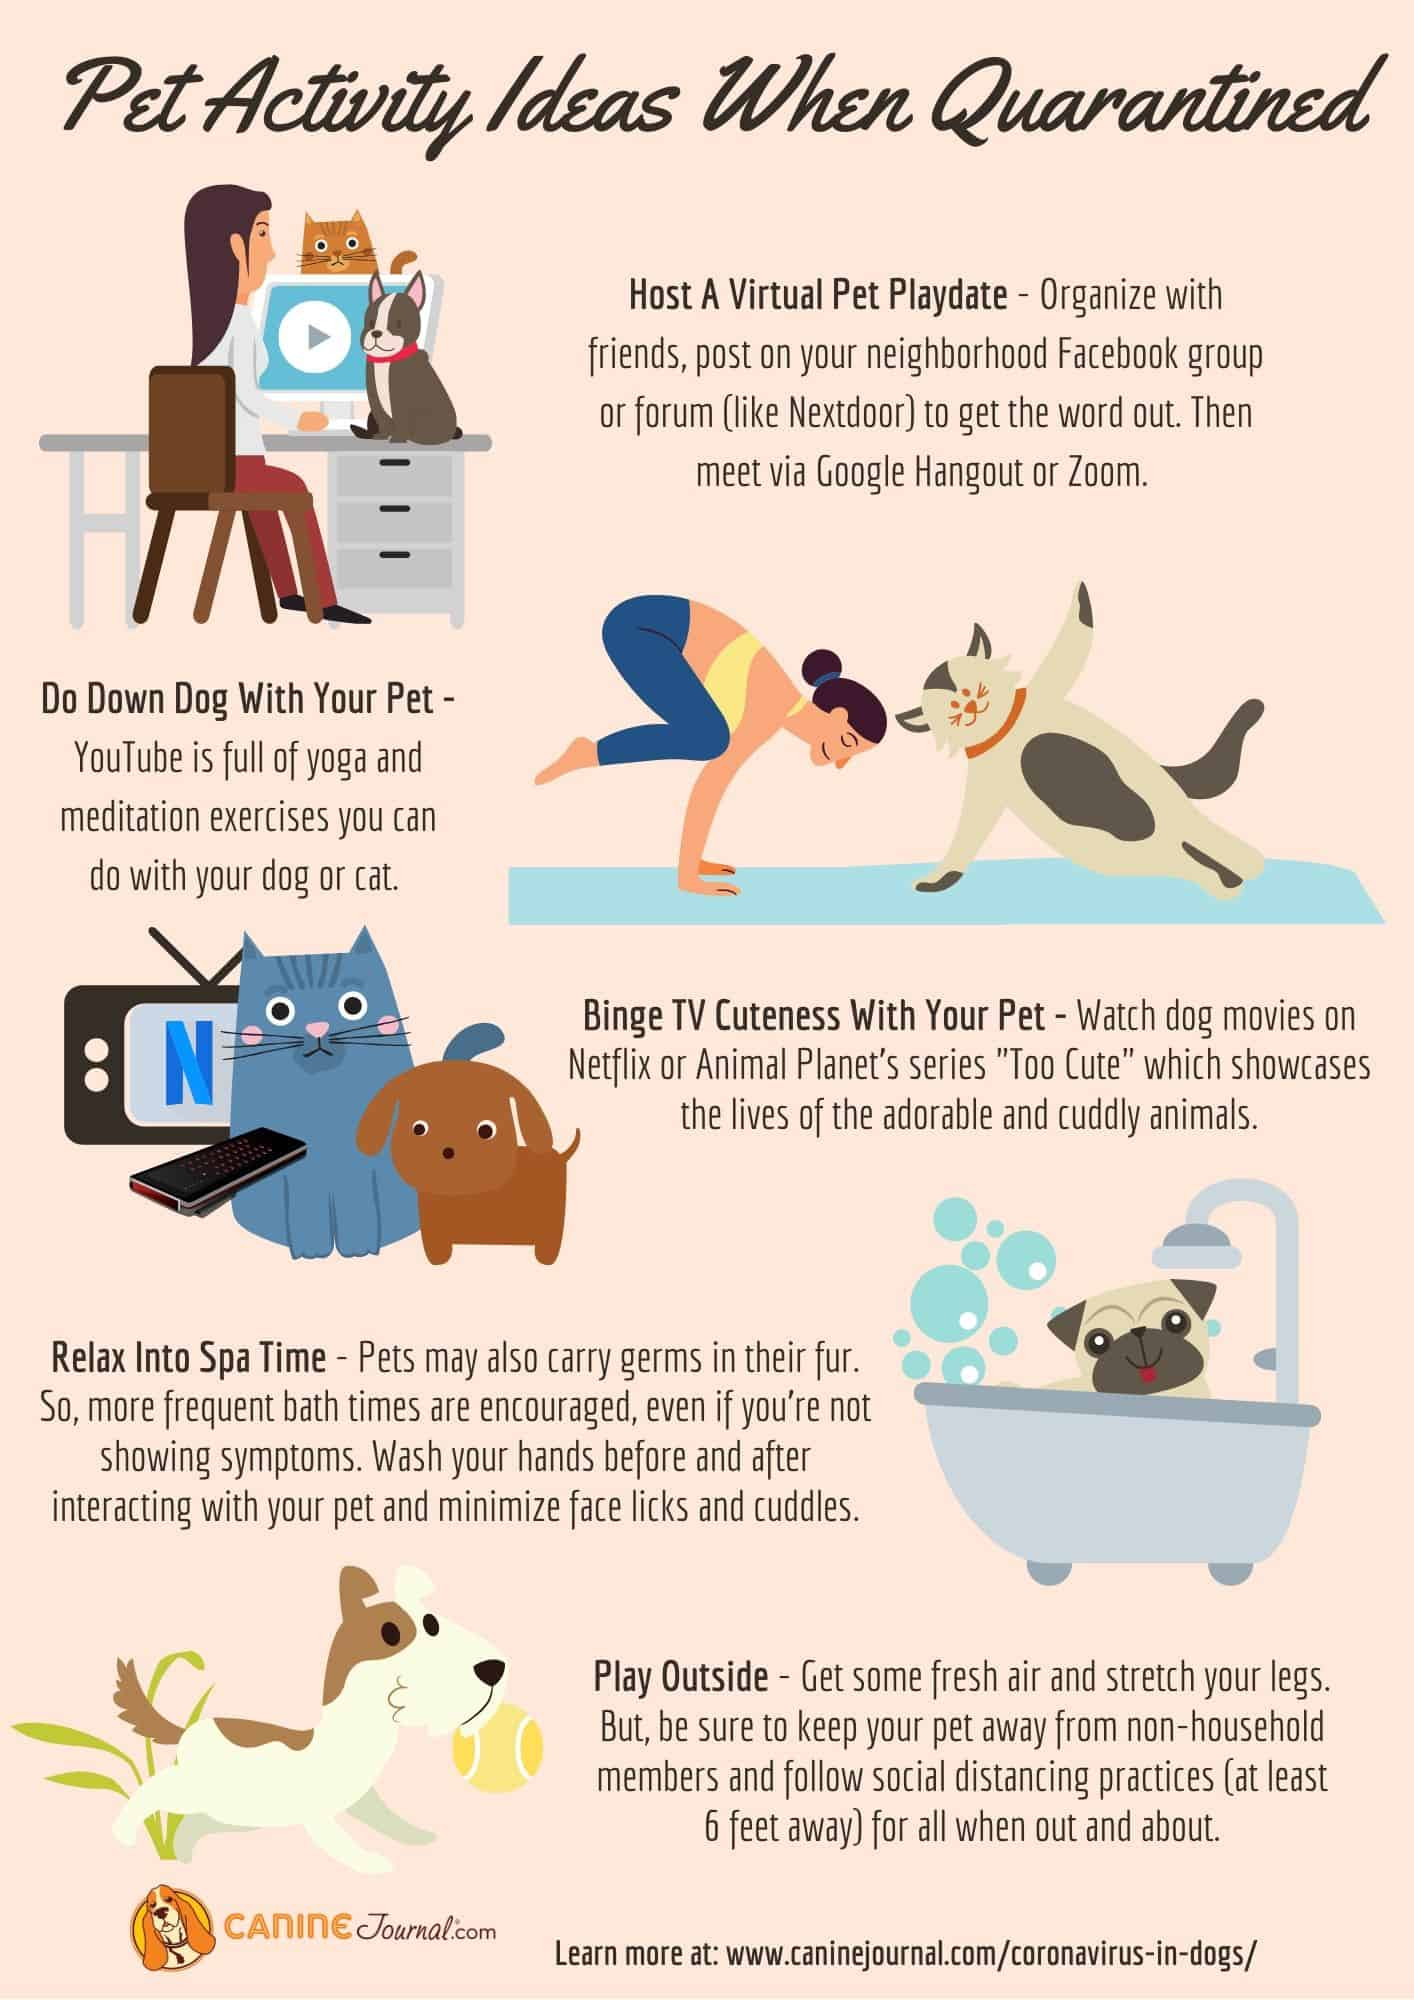 Pet Activity Ideas When Quarantined Graphic